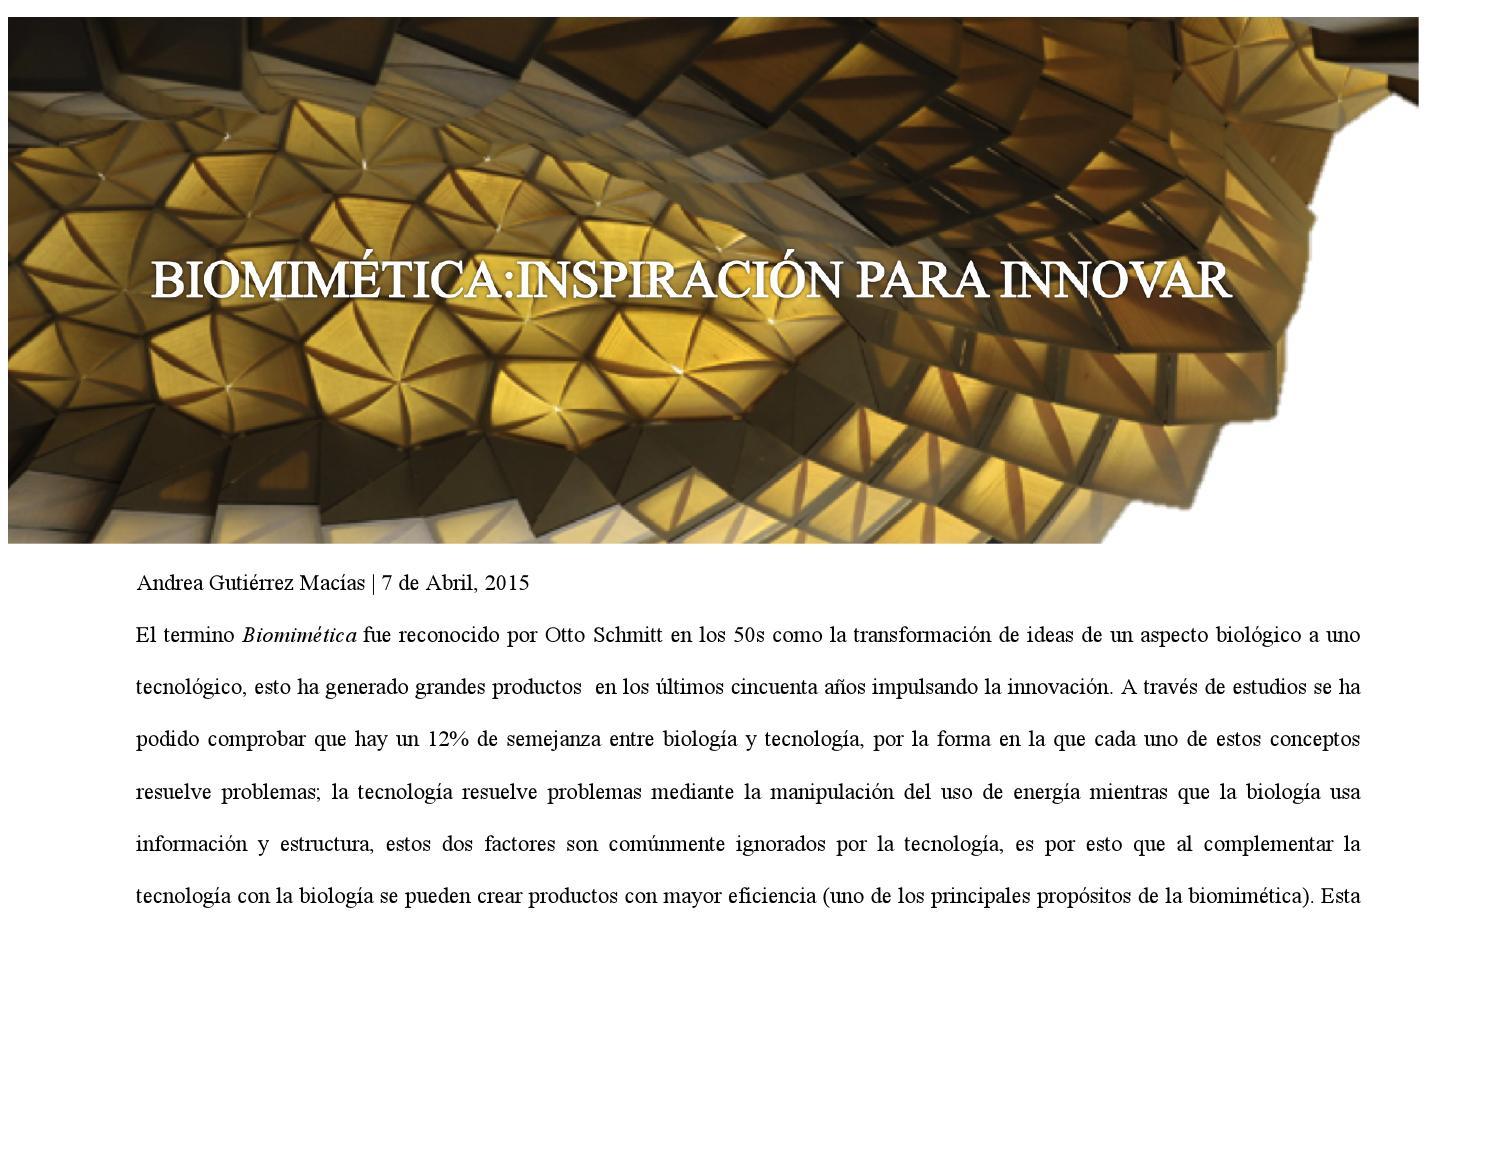 Biomimetica inspiracion para innovar by andrea gutierrez for Inspiracion sinonimo